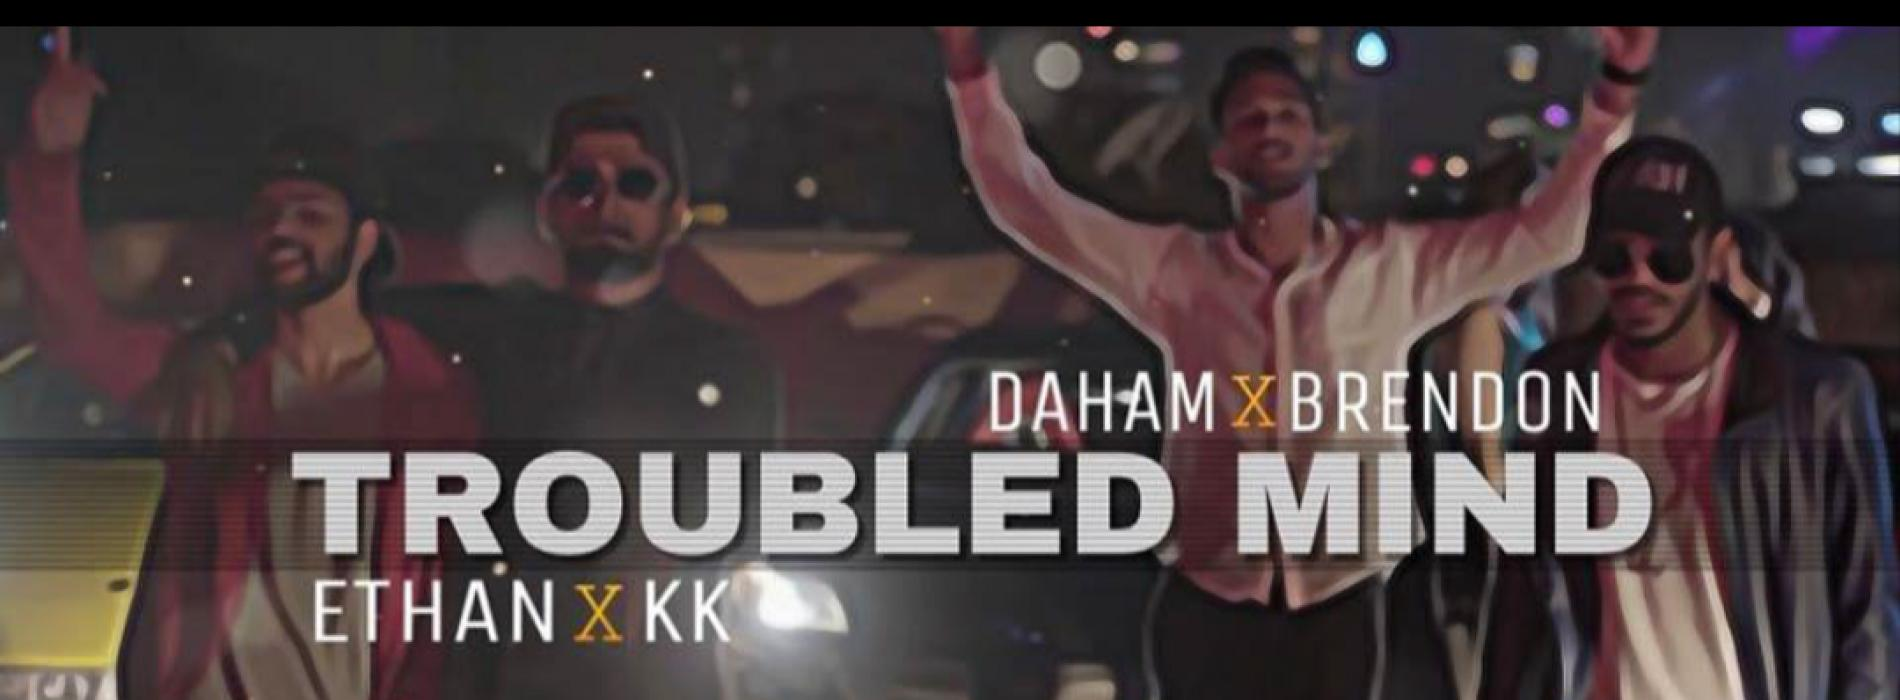 KK x Brendon x Daham x Ethan – TROUBLED MIND (Official Music Video)